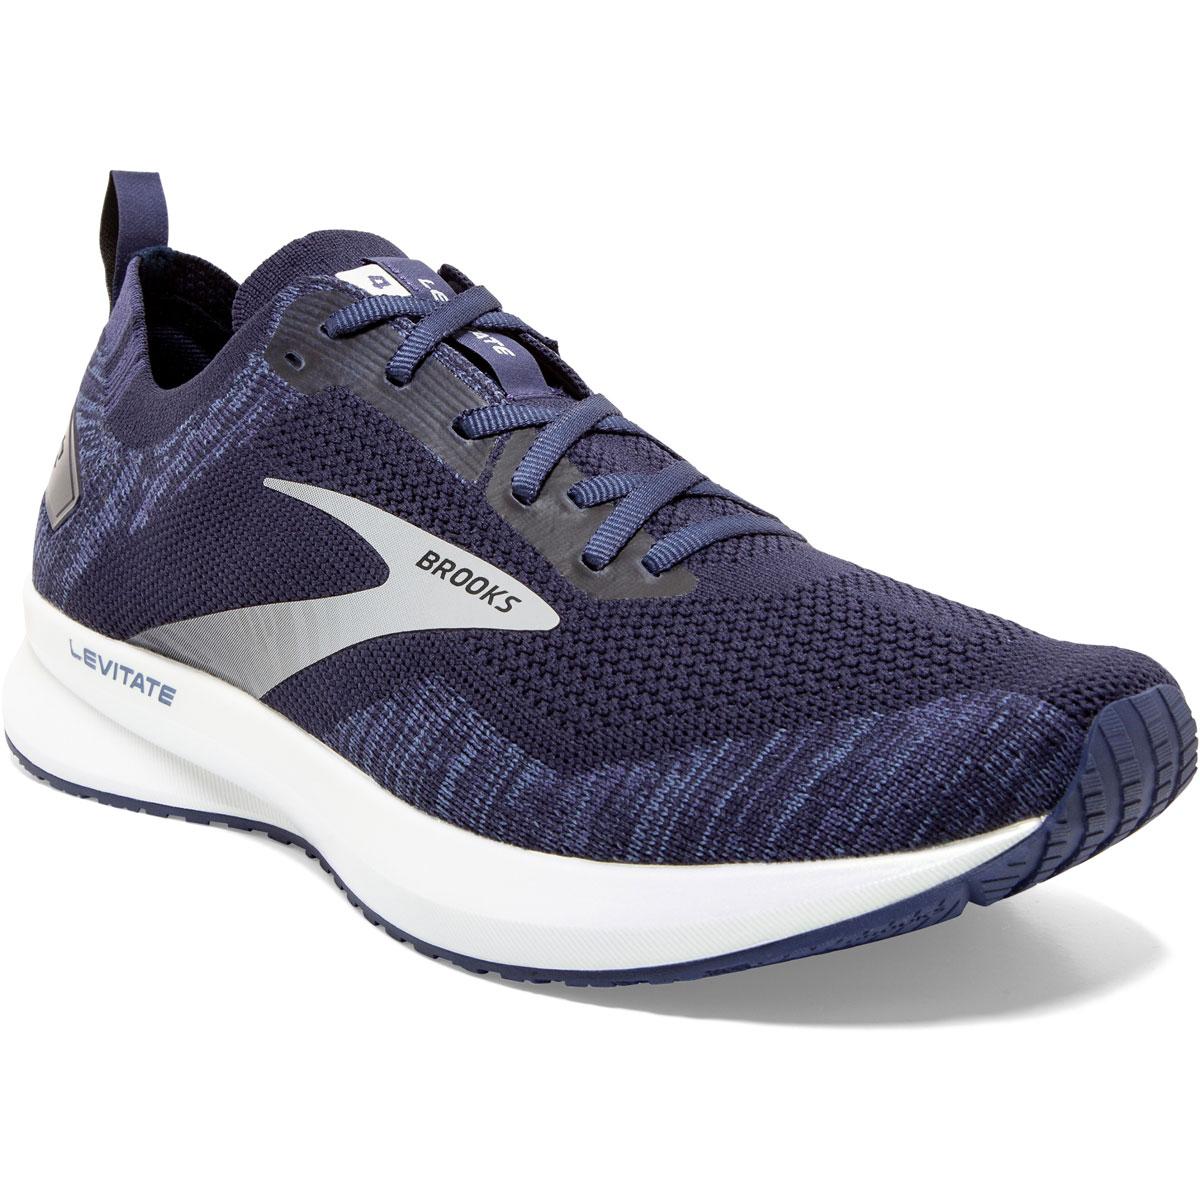 Men's Brooks Levitate 4 Running Shoe - Color: Navy/Grey/White - Size: 7 - Width: Regular, Navy/Grey/White, large, image 2